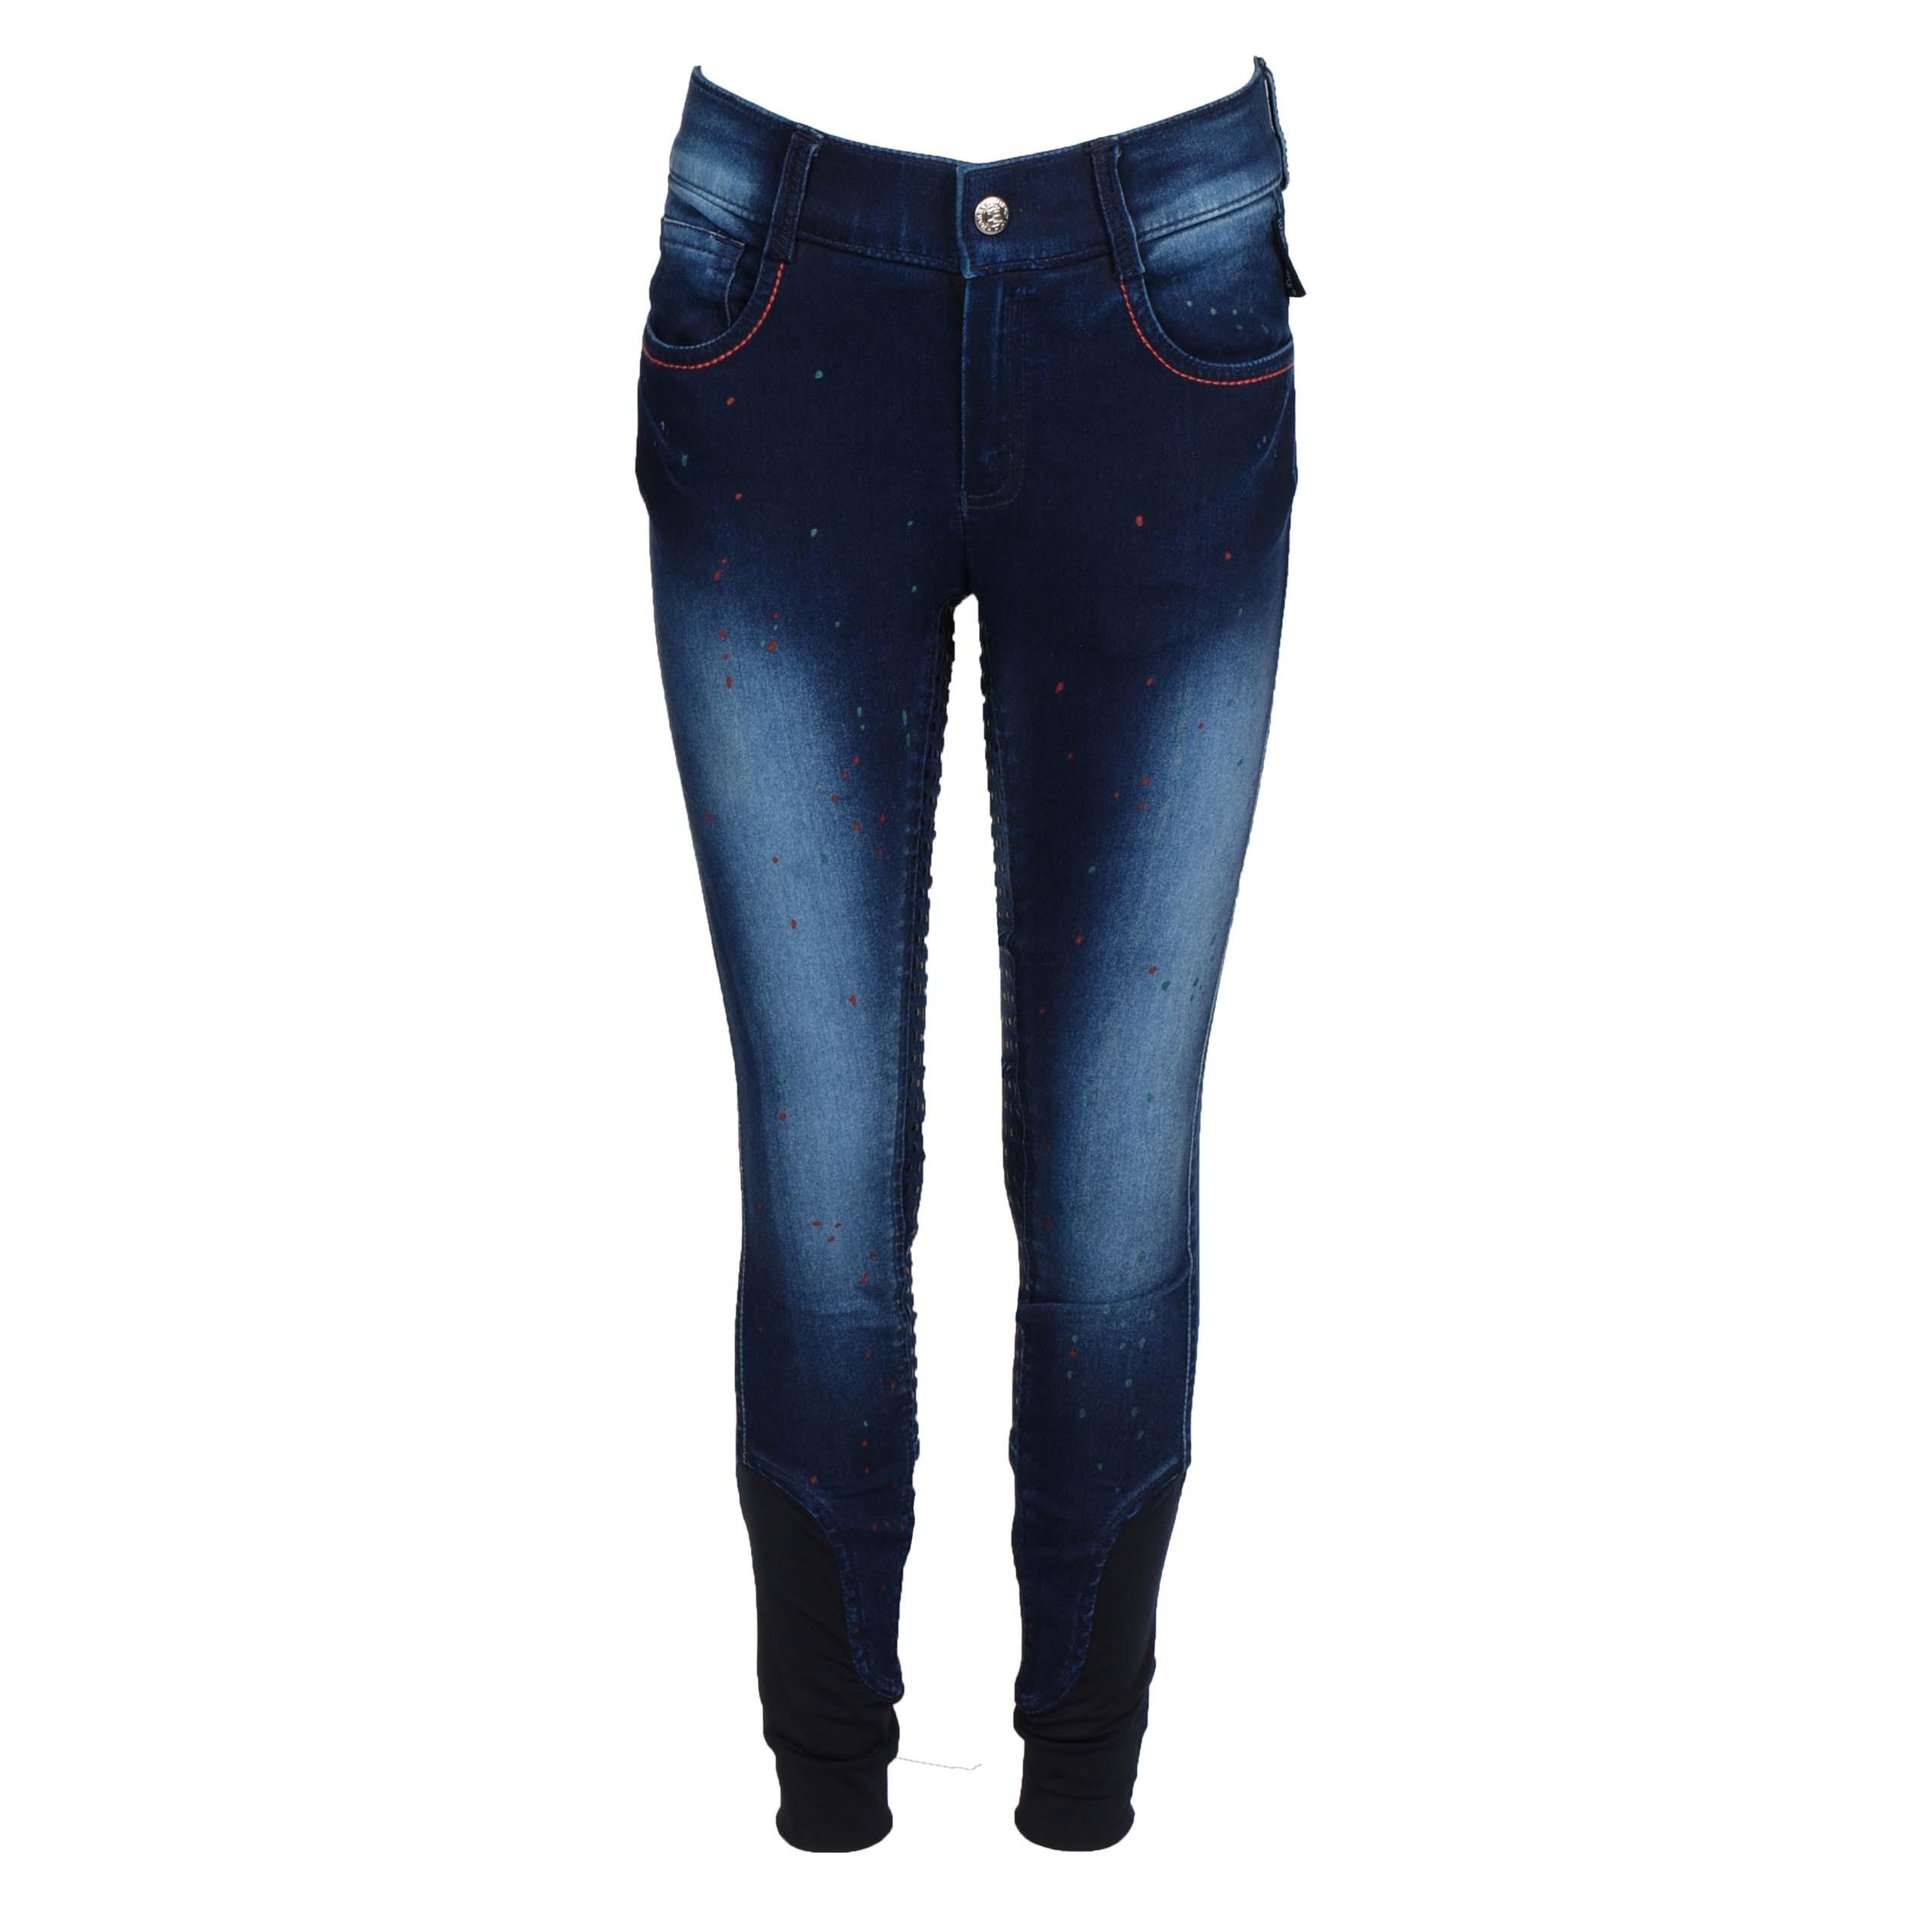 Harrys Horse Loulou Sanddrif FG kinder rijbroek jeans maat:164